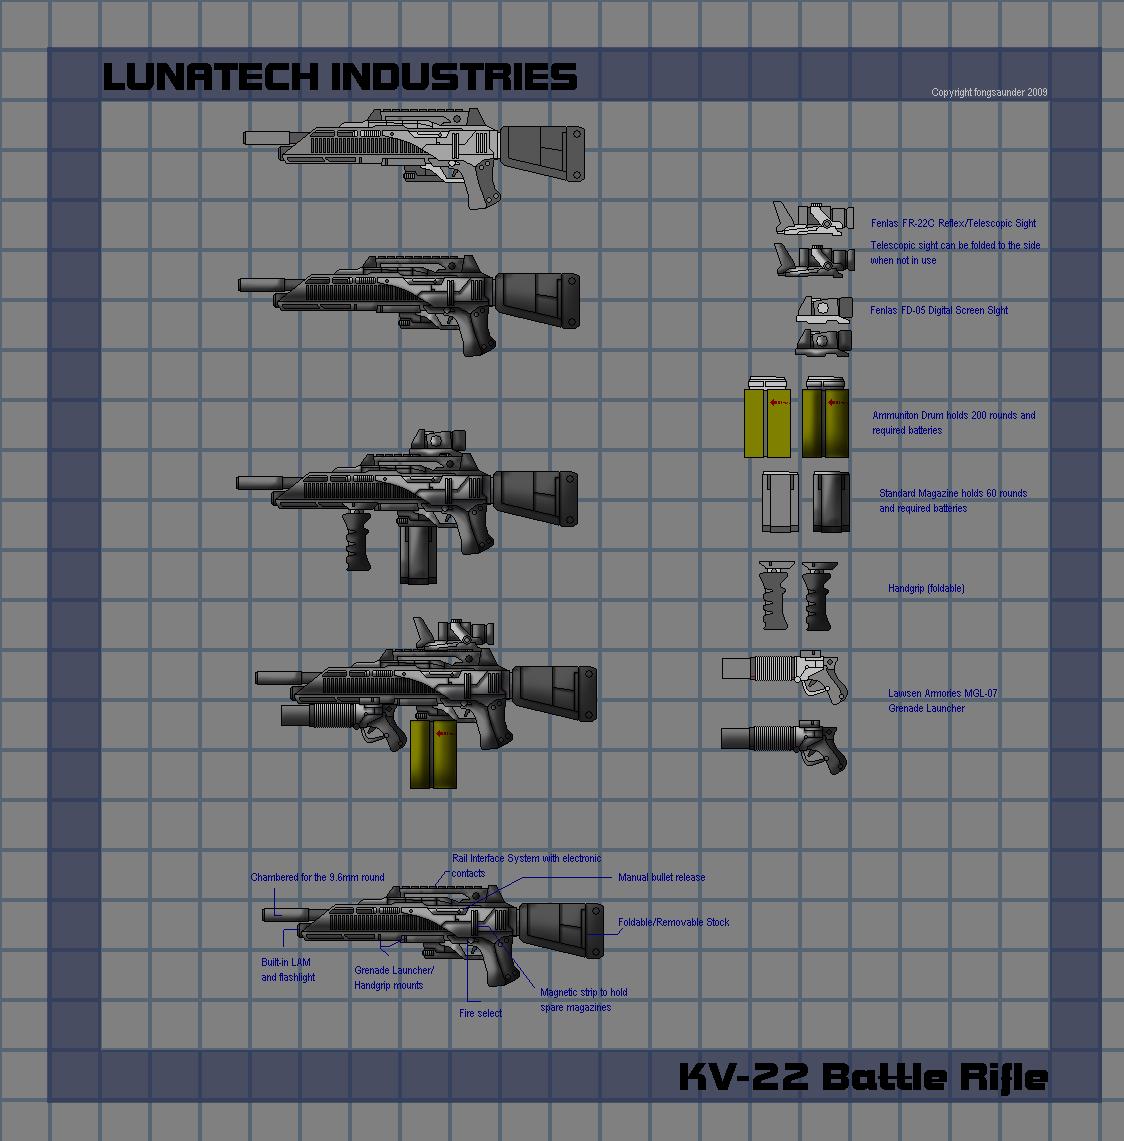 Lunatech KV-22 Battle Rifle by fongsaunder